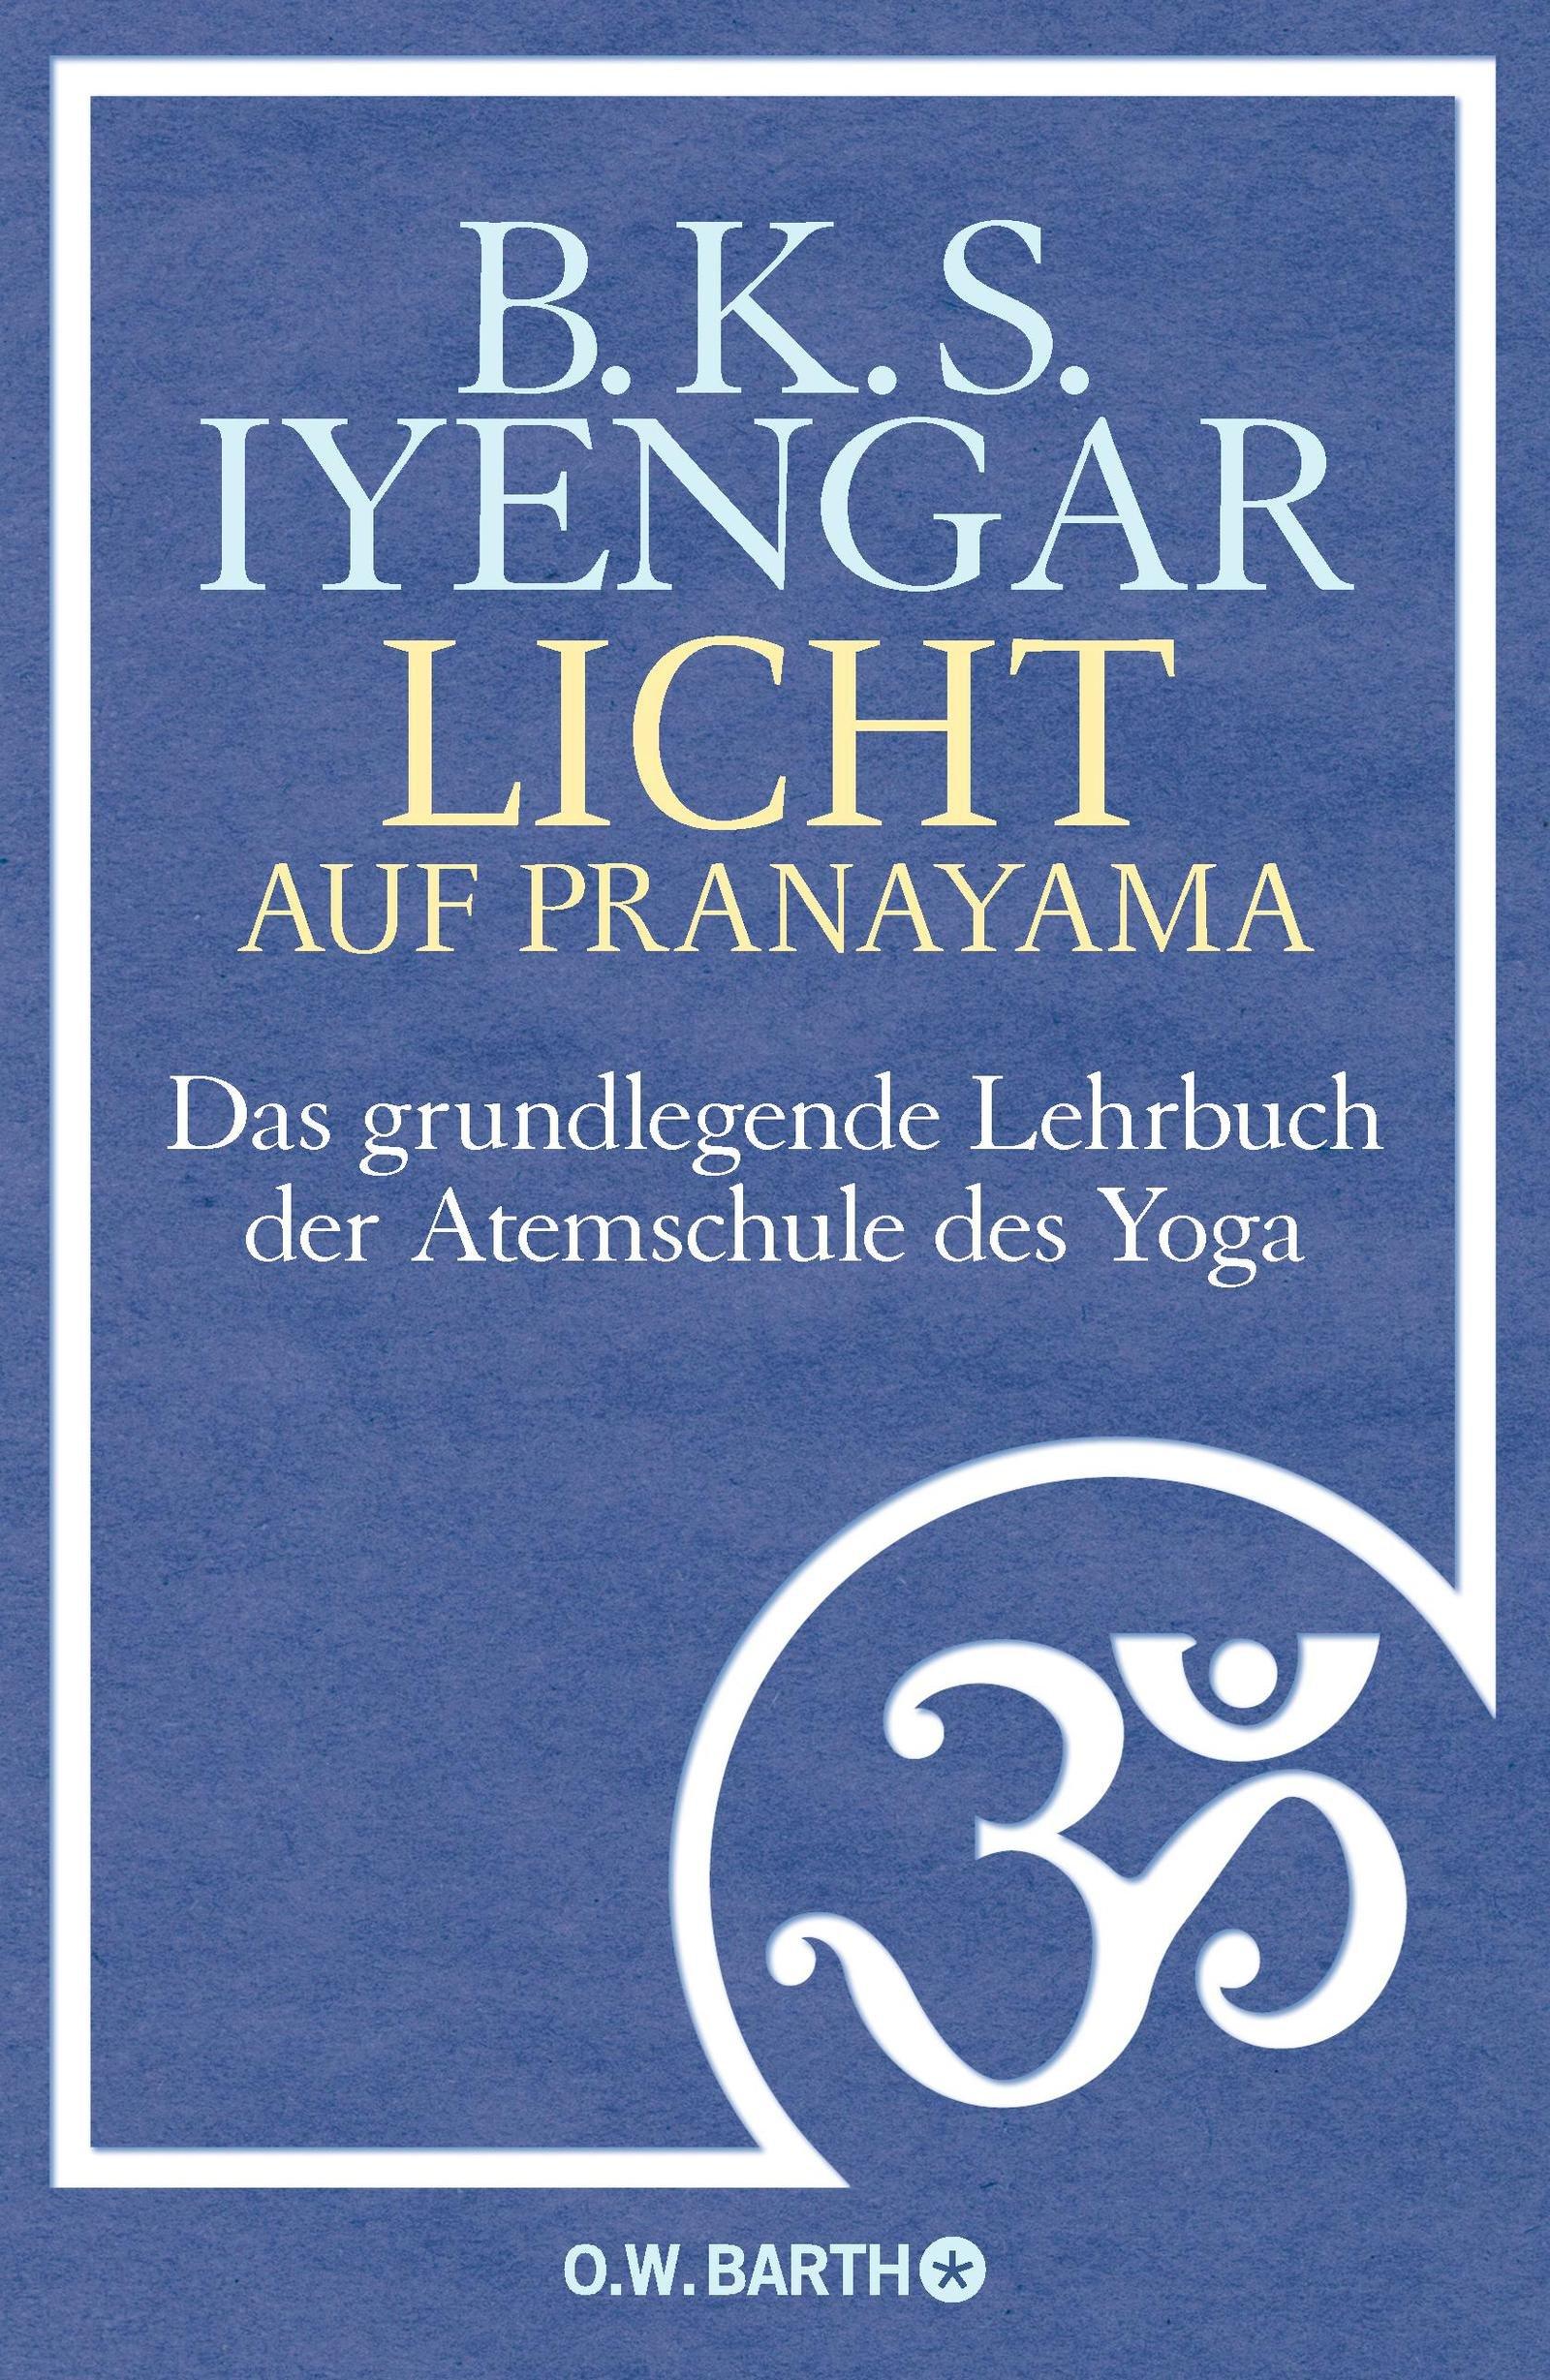 Licht auf Pranayama: Das grundlegende Lehrbuch der Atemschule des Yoga Gebundenes Buch – 3. September 2012 B. K. S. Iyengar Hans Ulrich Möhring O.W. Barth 3426292130